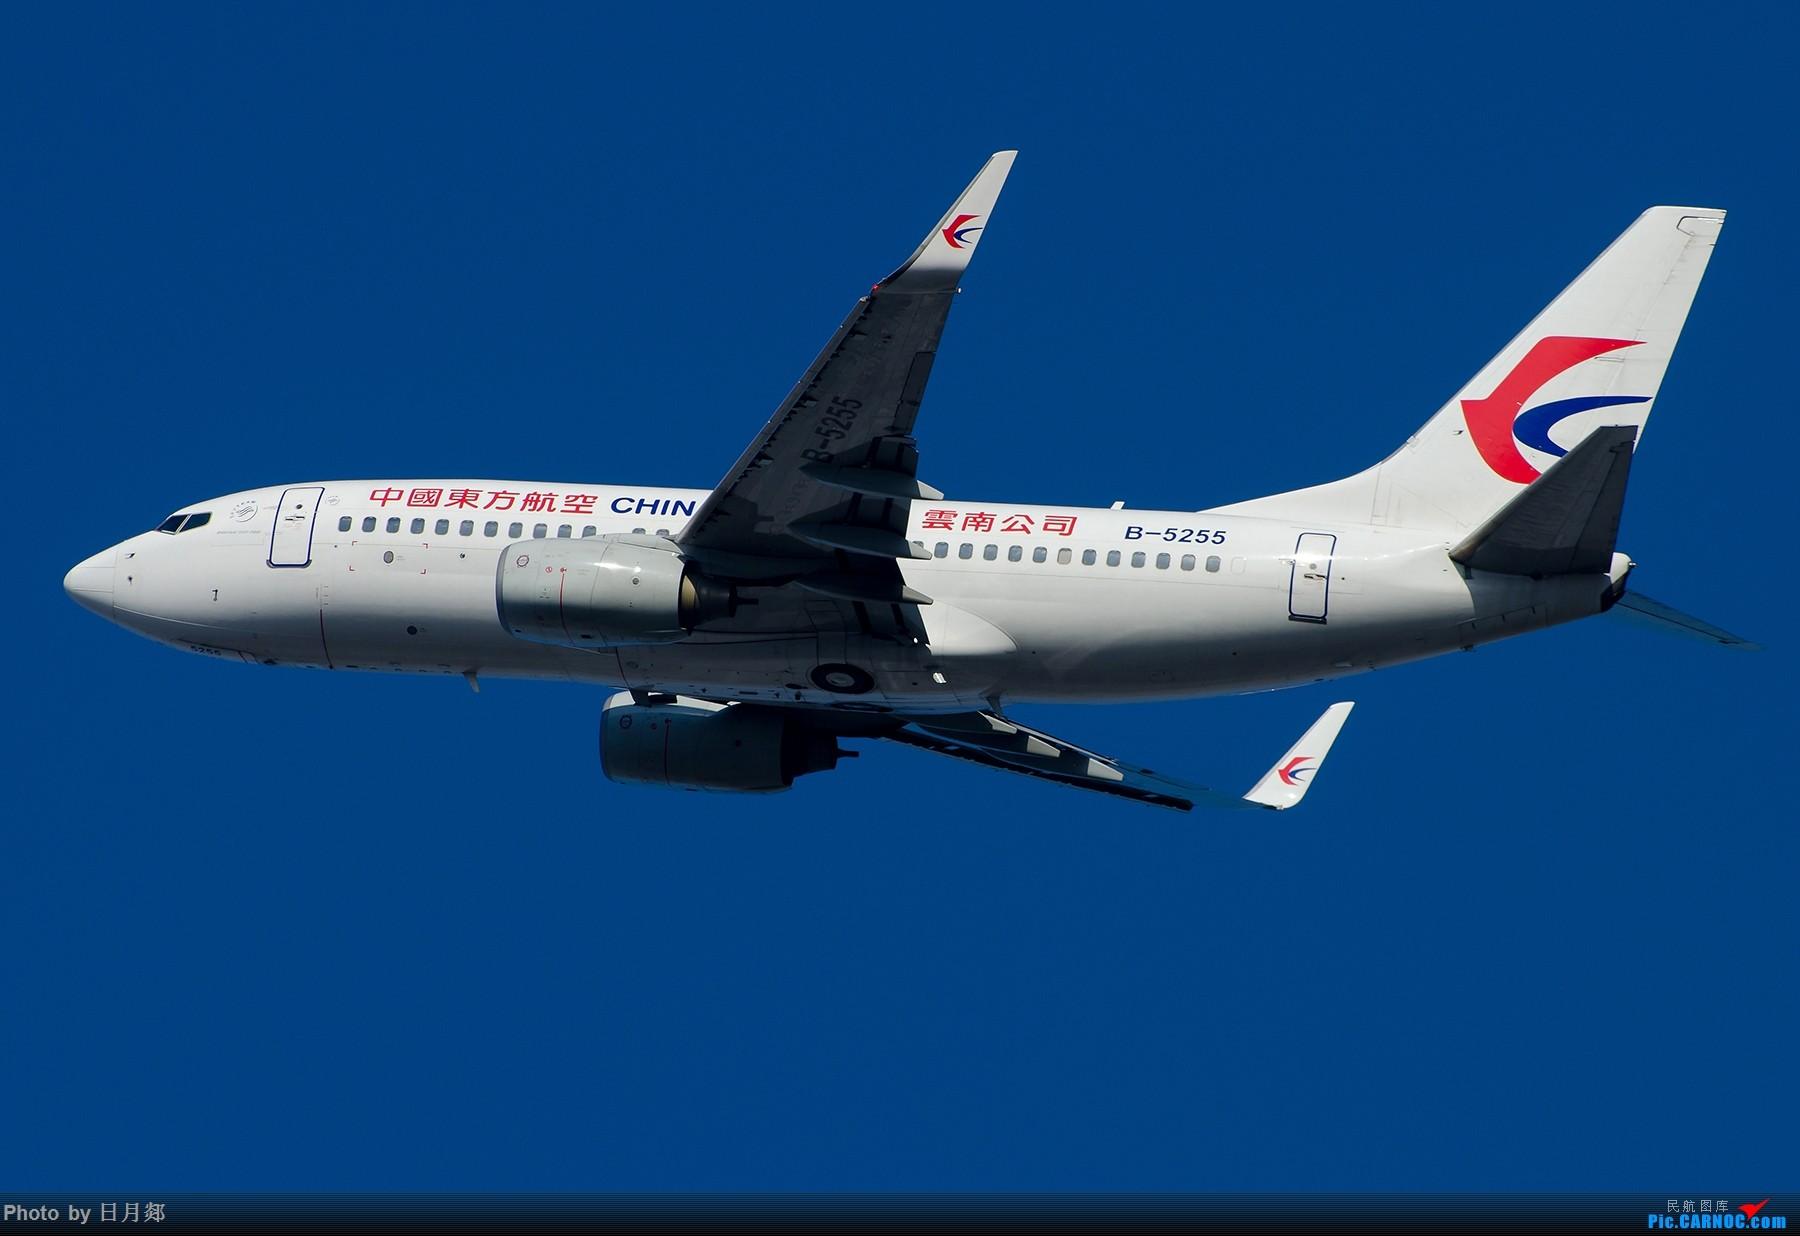 Re:[原创]【SHA拍机*1800大图】虹桥起飞一组,那天真是蓝的不要不要的 BOEING 737-700 B-5255 中国上海虹桥国际机场